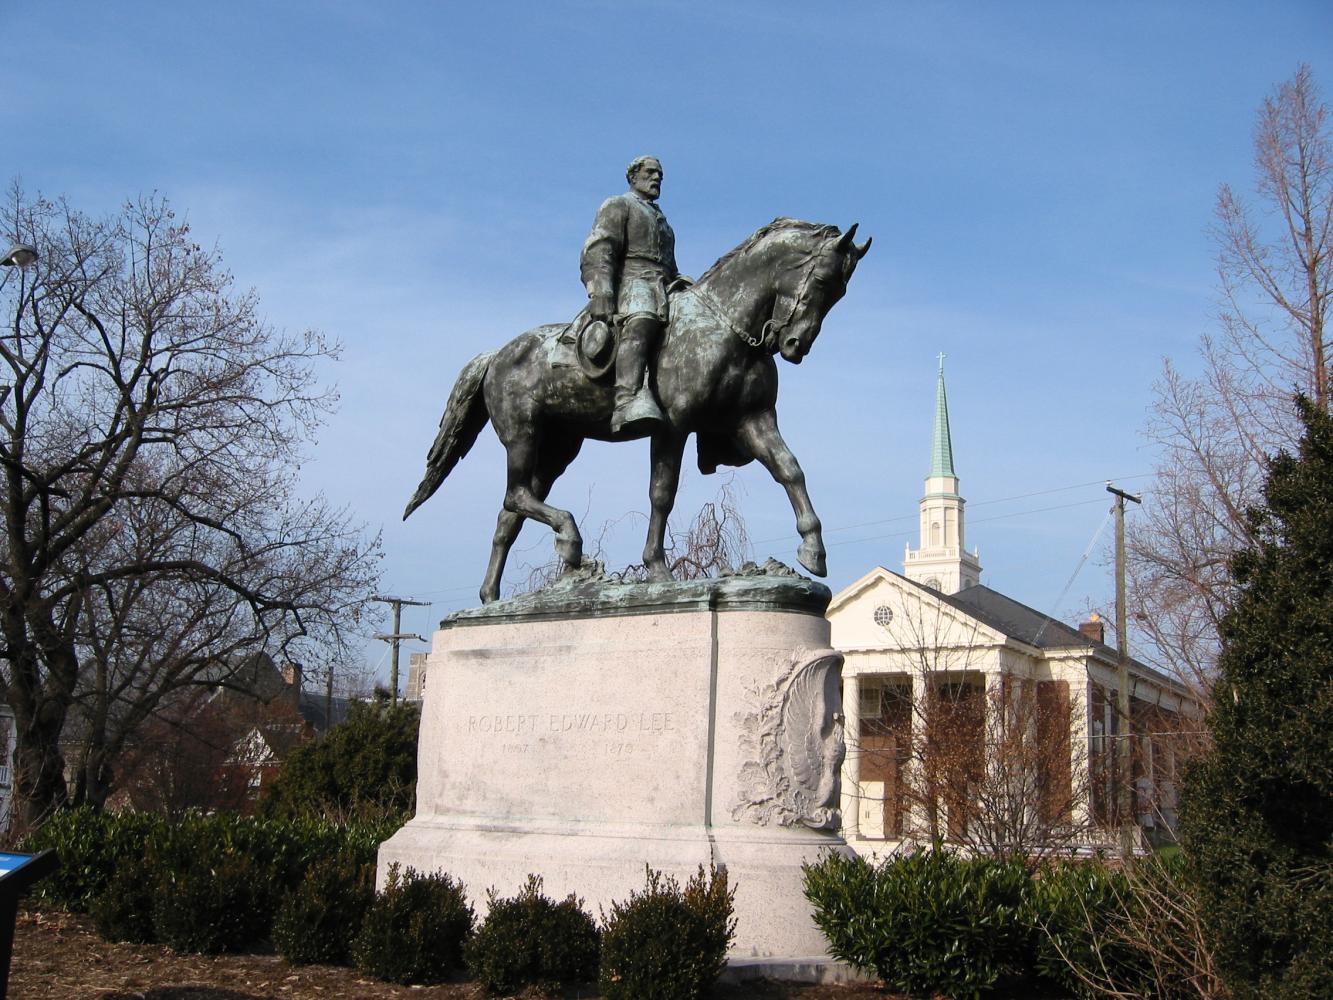 Robert E Lee's statue in Charlottesville, VA